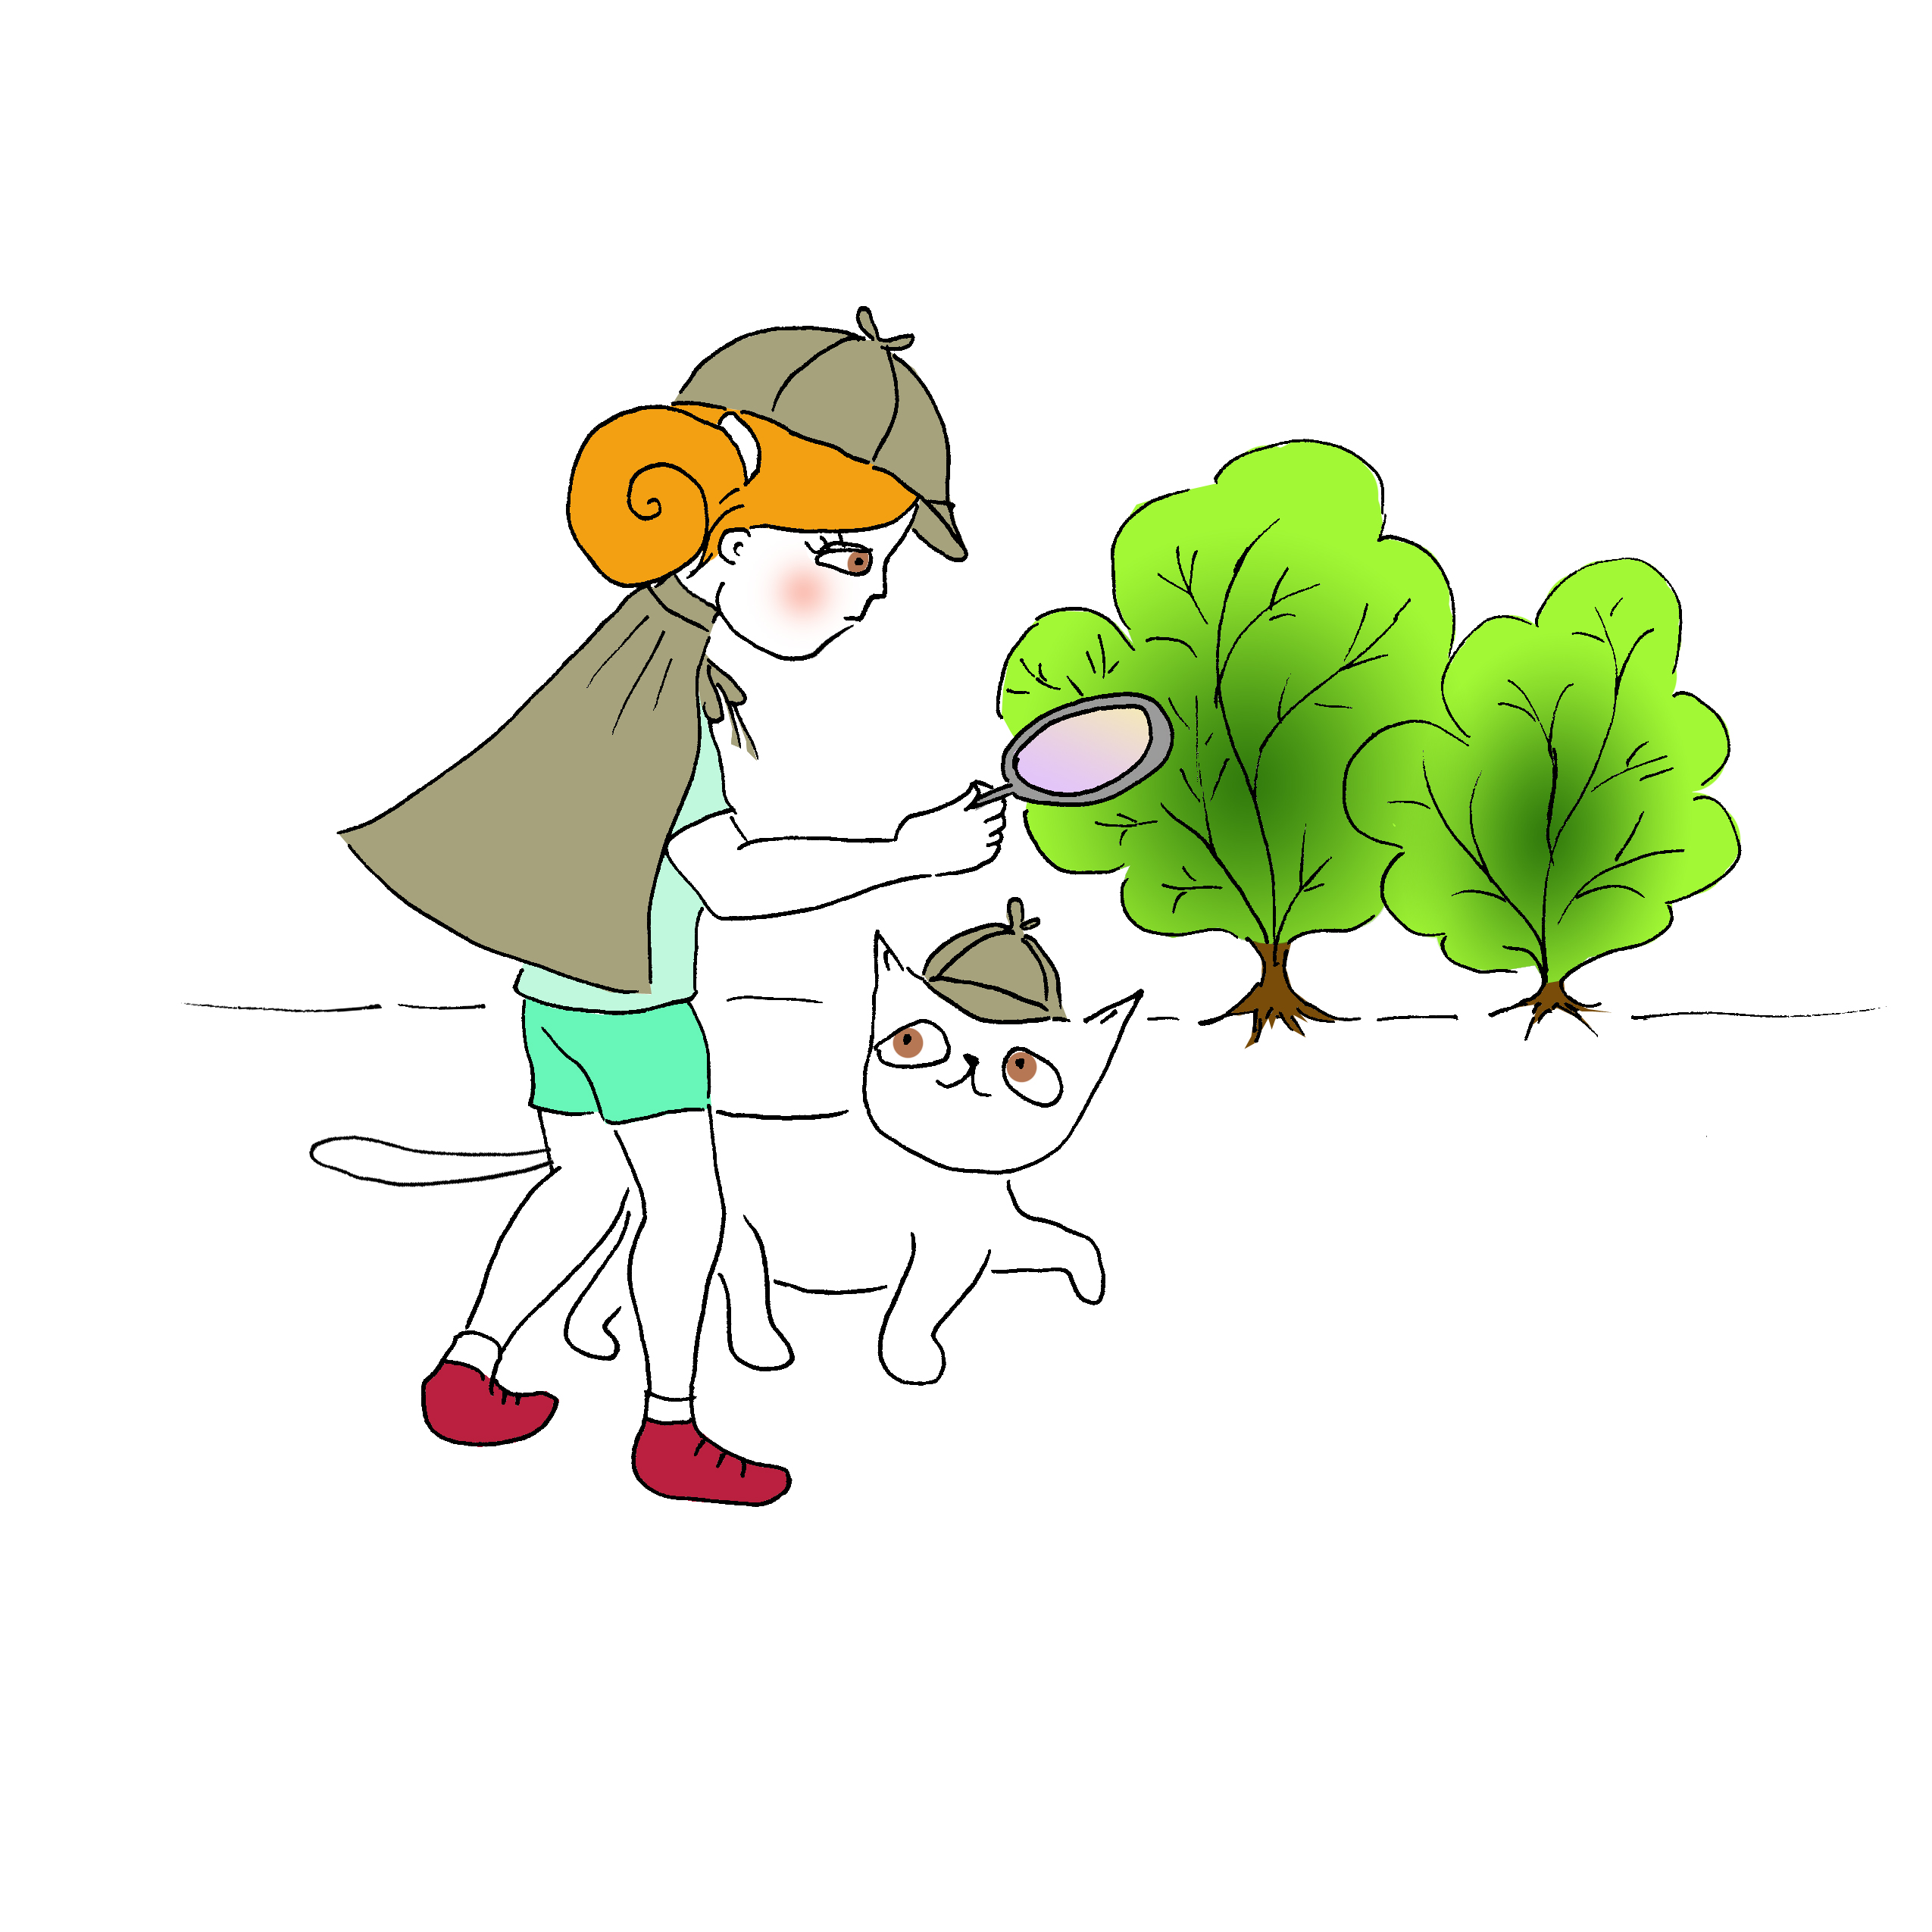 Мими&Китти – 15 – Мими ищет новую подругу by Irena Brodeski - Illustrated by Irena Brodeski - Ourboox.com